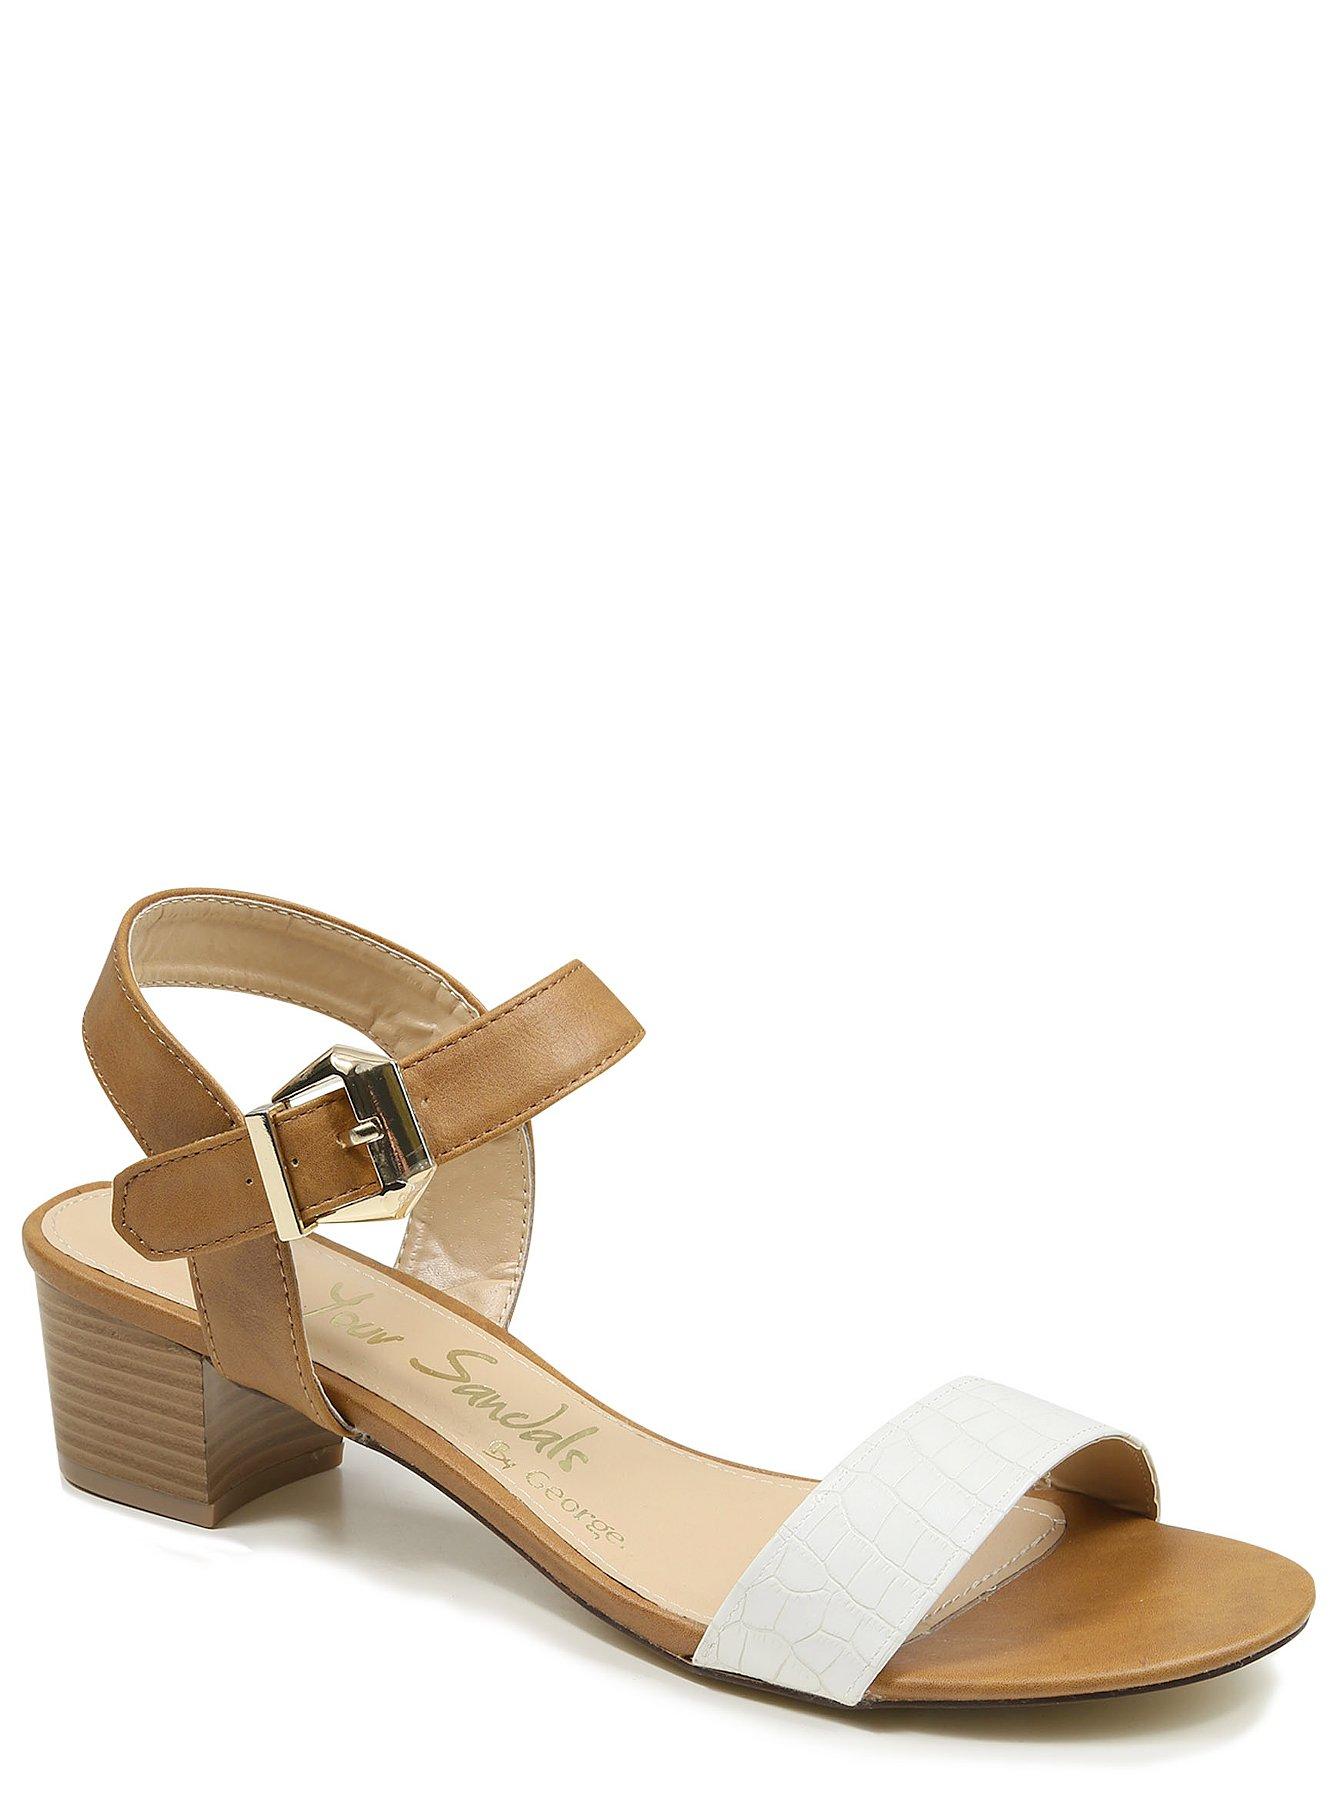 Black sandals asda - Black Sandals Asda 46